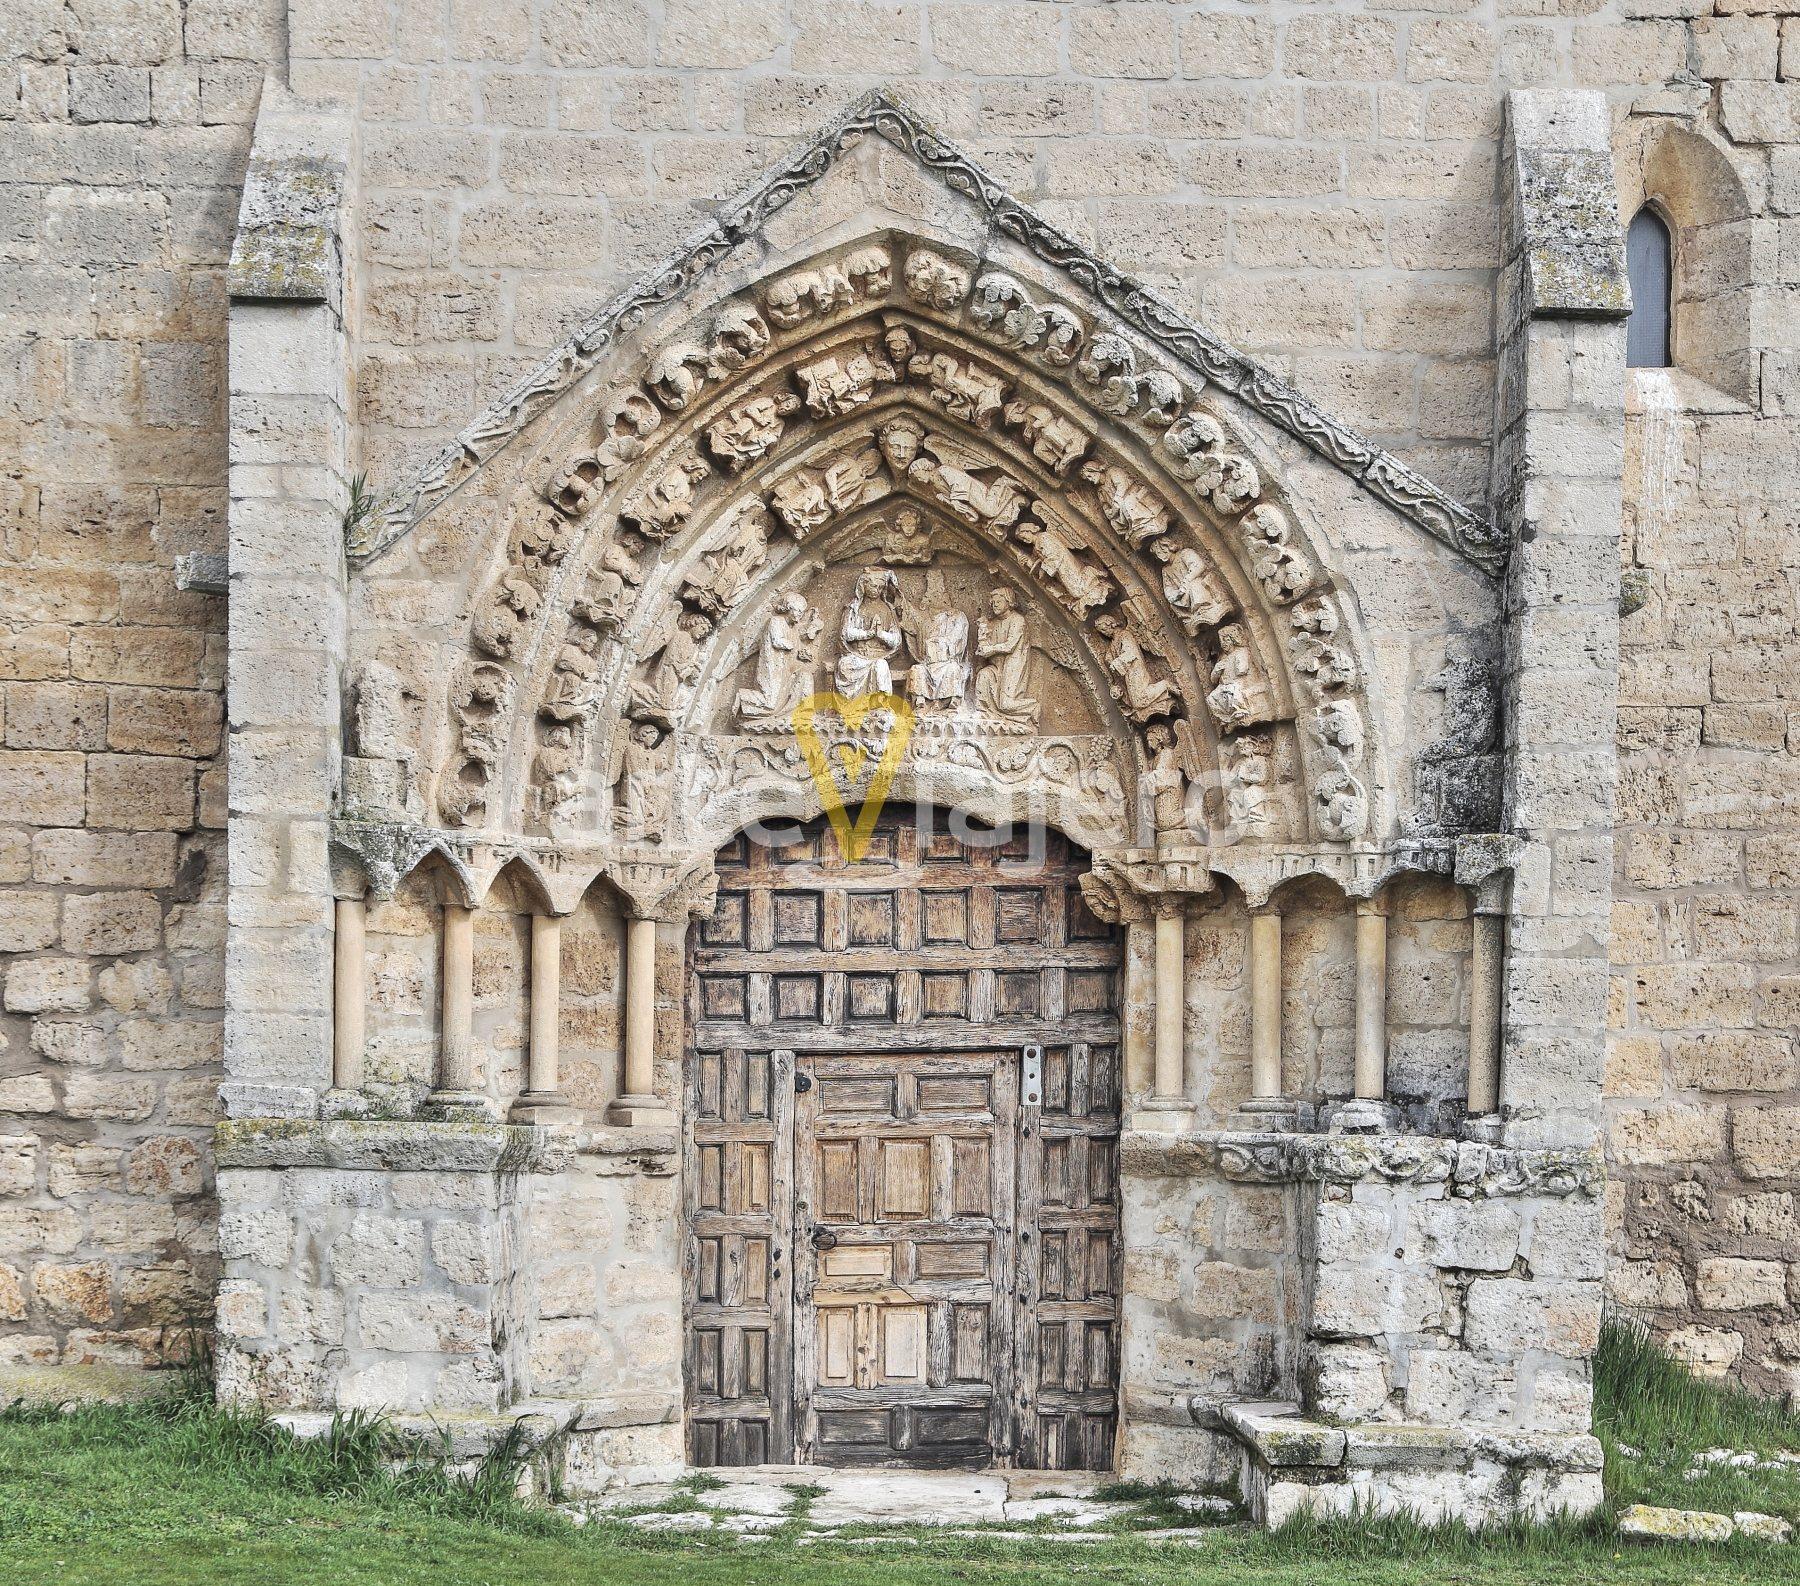 iglesia de villaldemiro